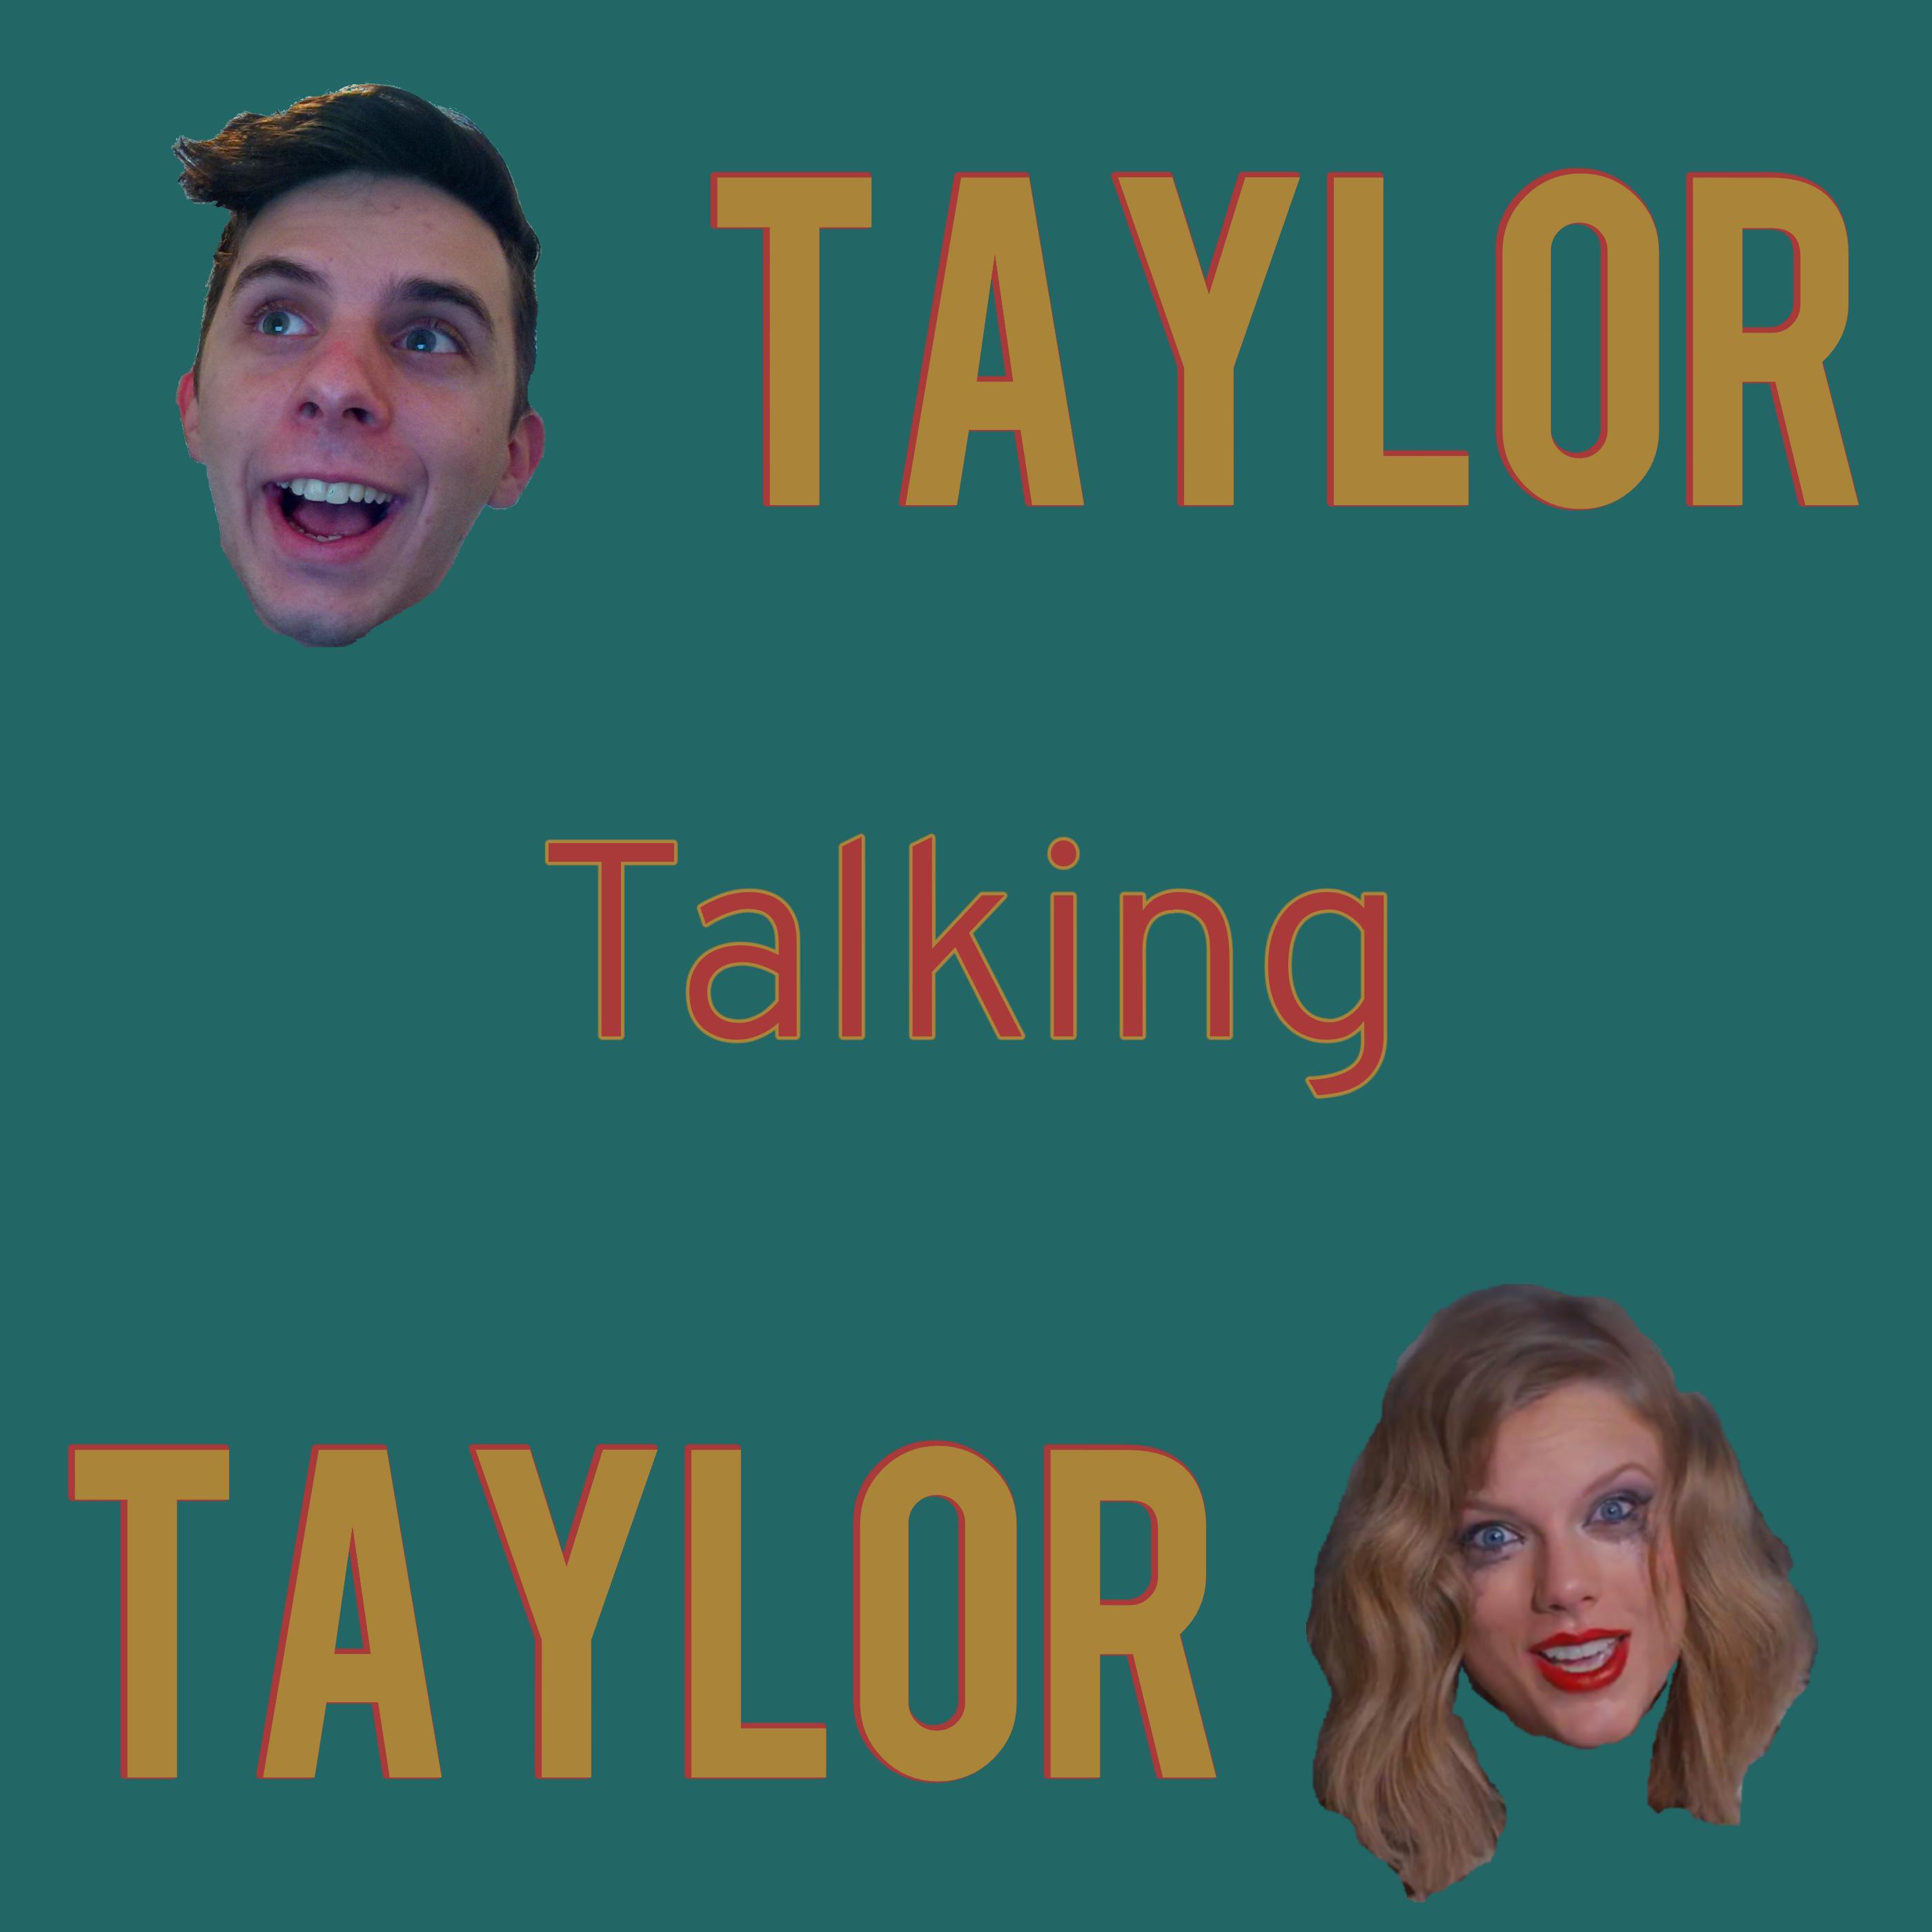 Taylor Talking Taylor show image